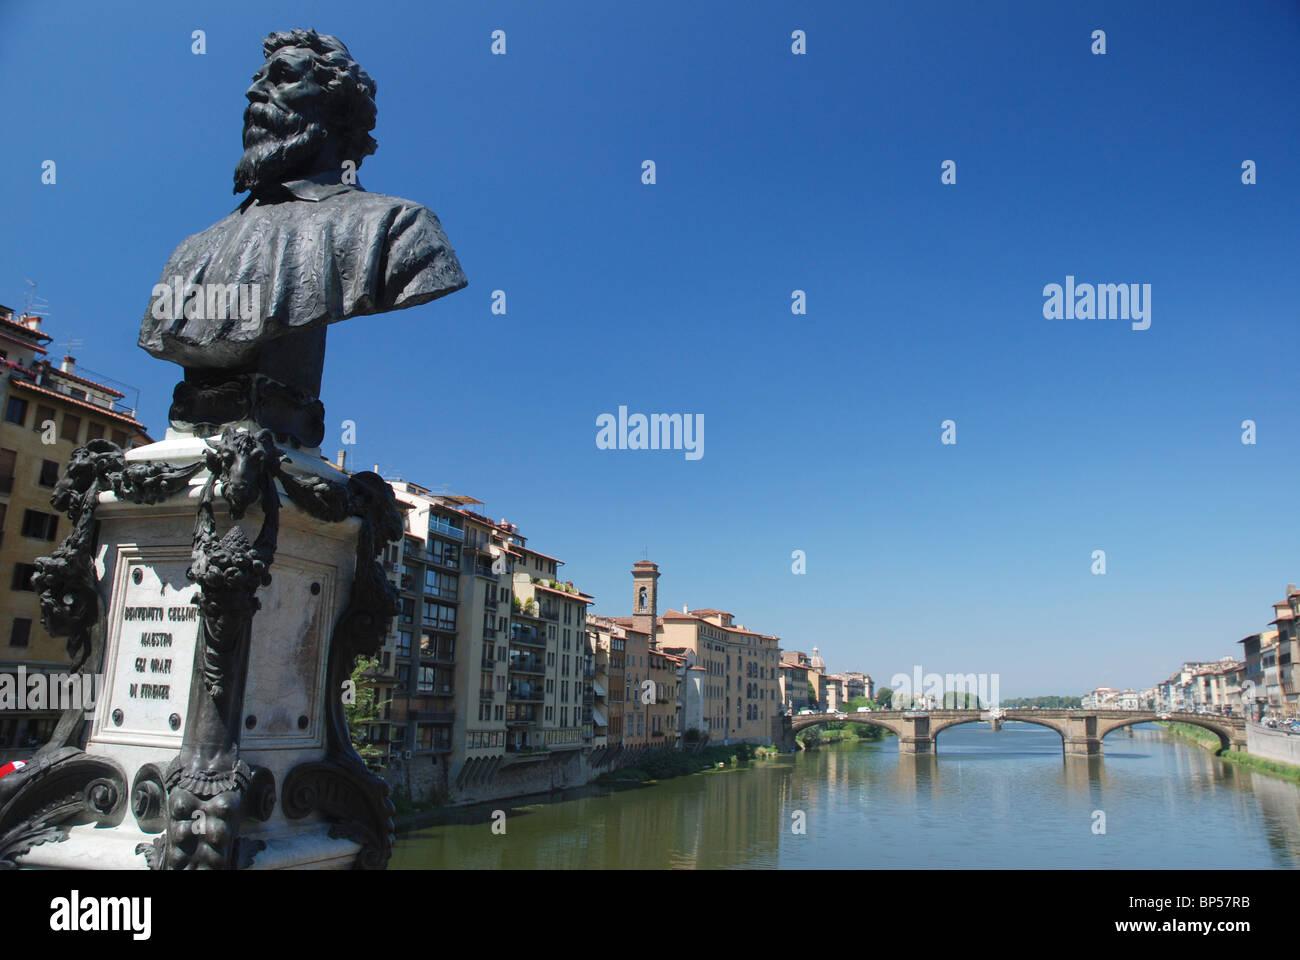 Statue of Benvenuto Cellini on Ponte Vecchio Bridge, Florence, Italy. - Stock Image